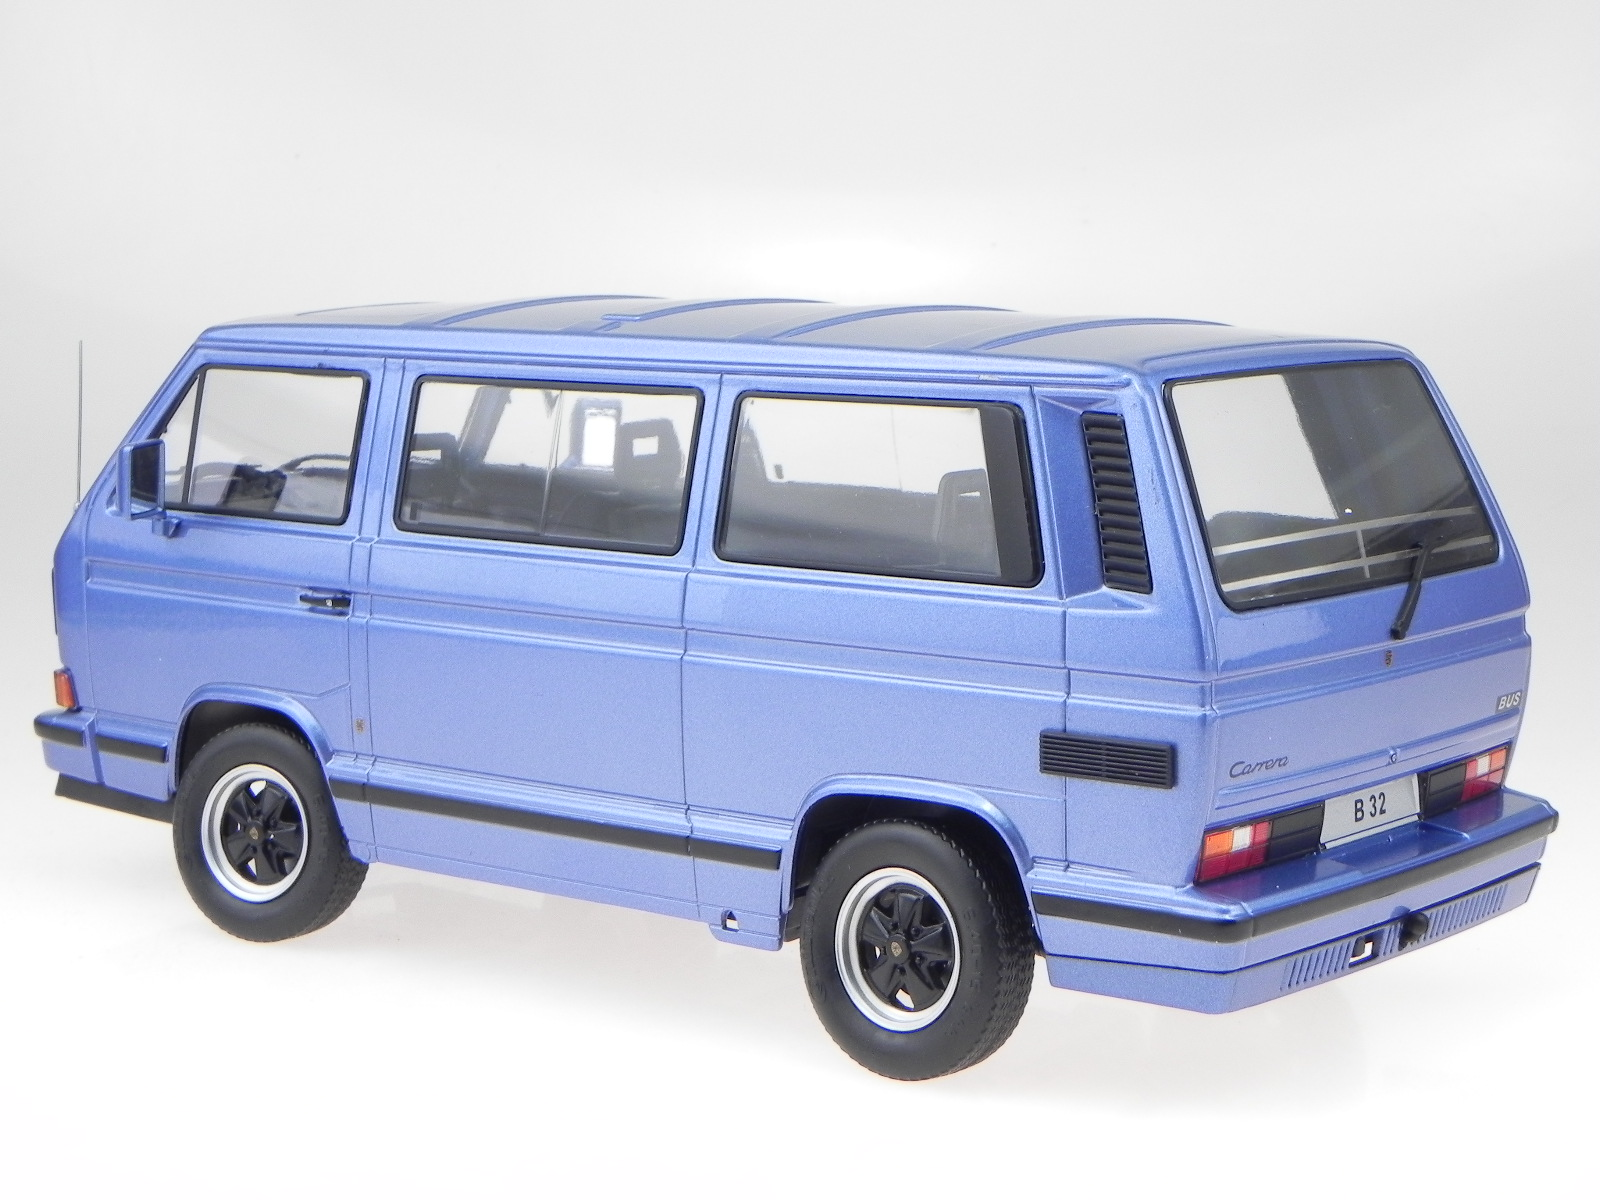 VW T3 B32 B32 B32 Porsche Bus bleu véhicule miniature 180222 véhicule miniature KK-Scale 3c7365